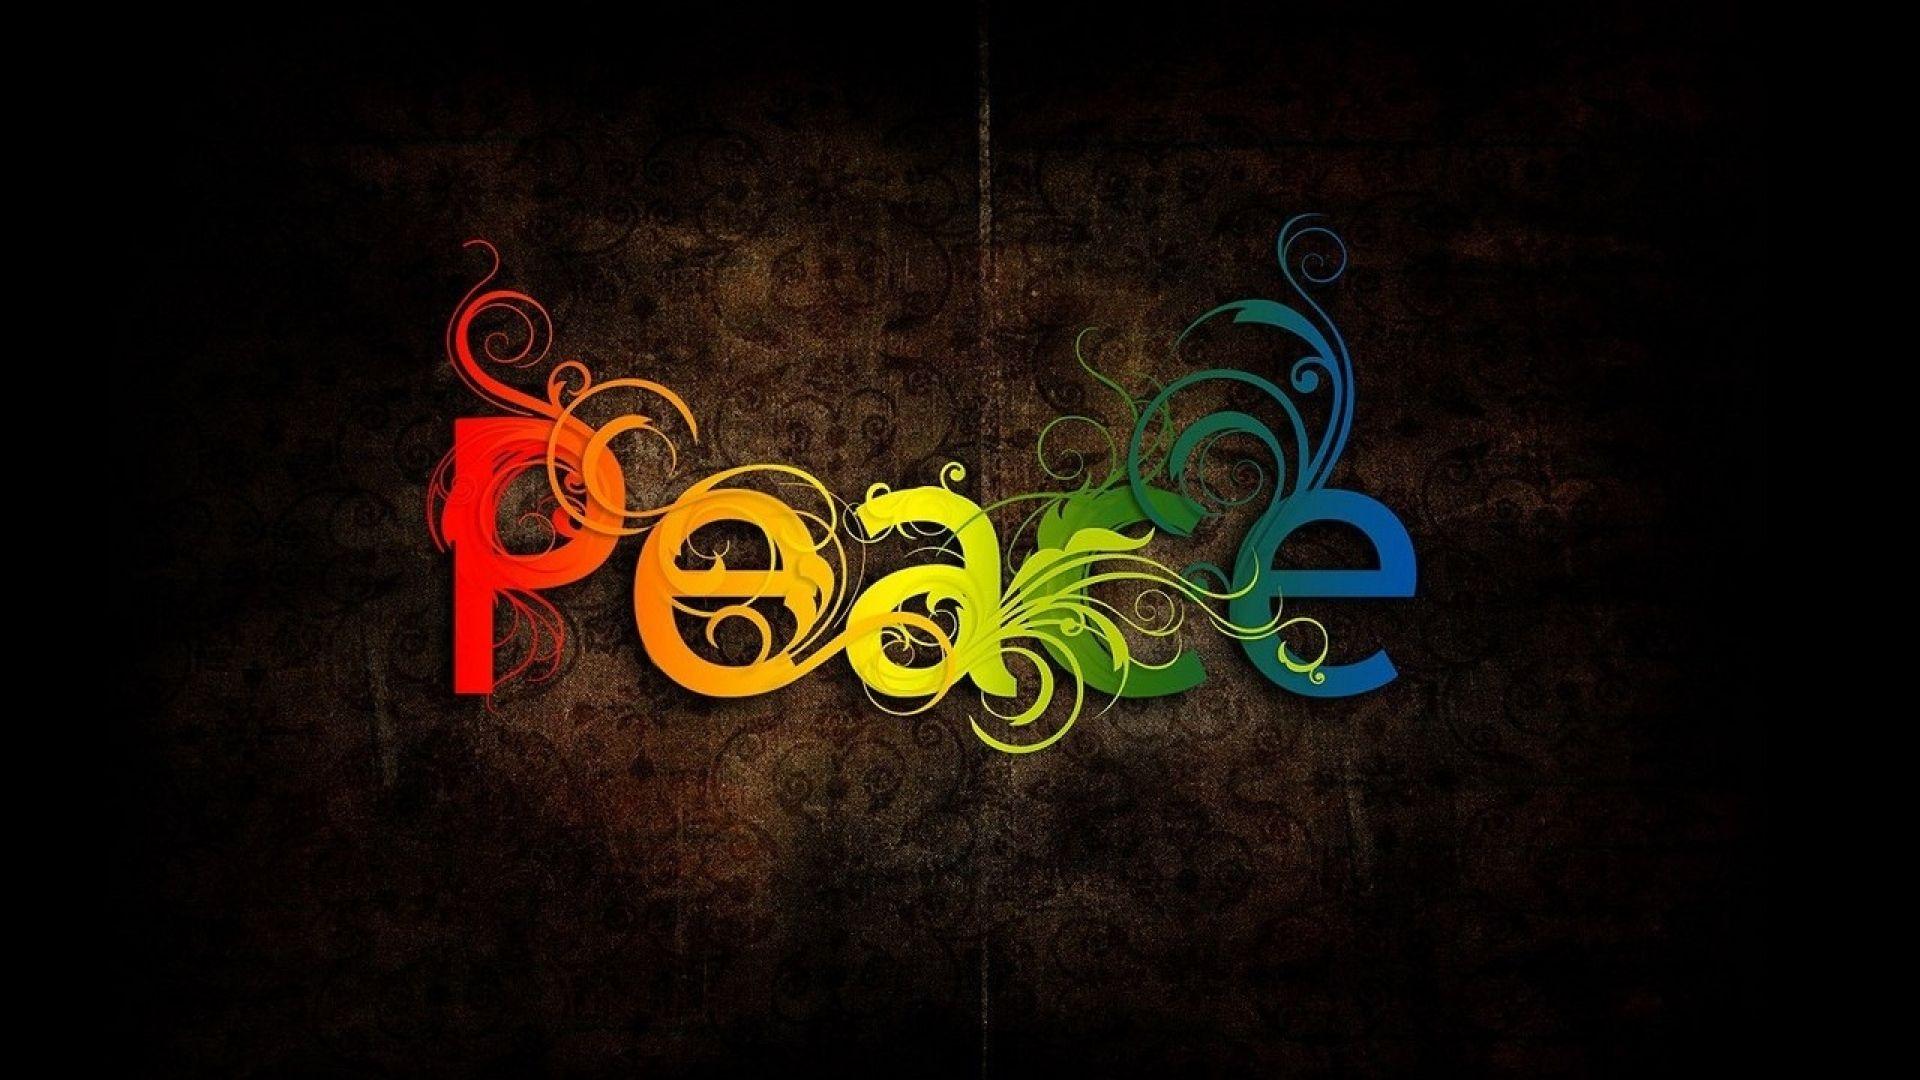 Colorful Peace Wallpaper Wide - Peace Wallpaper For Desktop , HD Wallpaper & Backgrounds